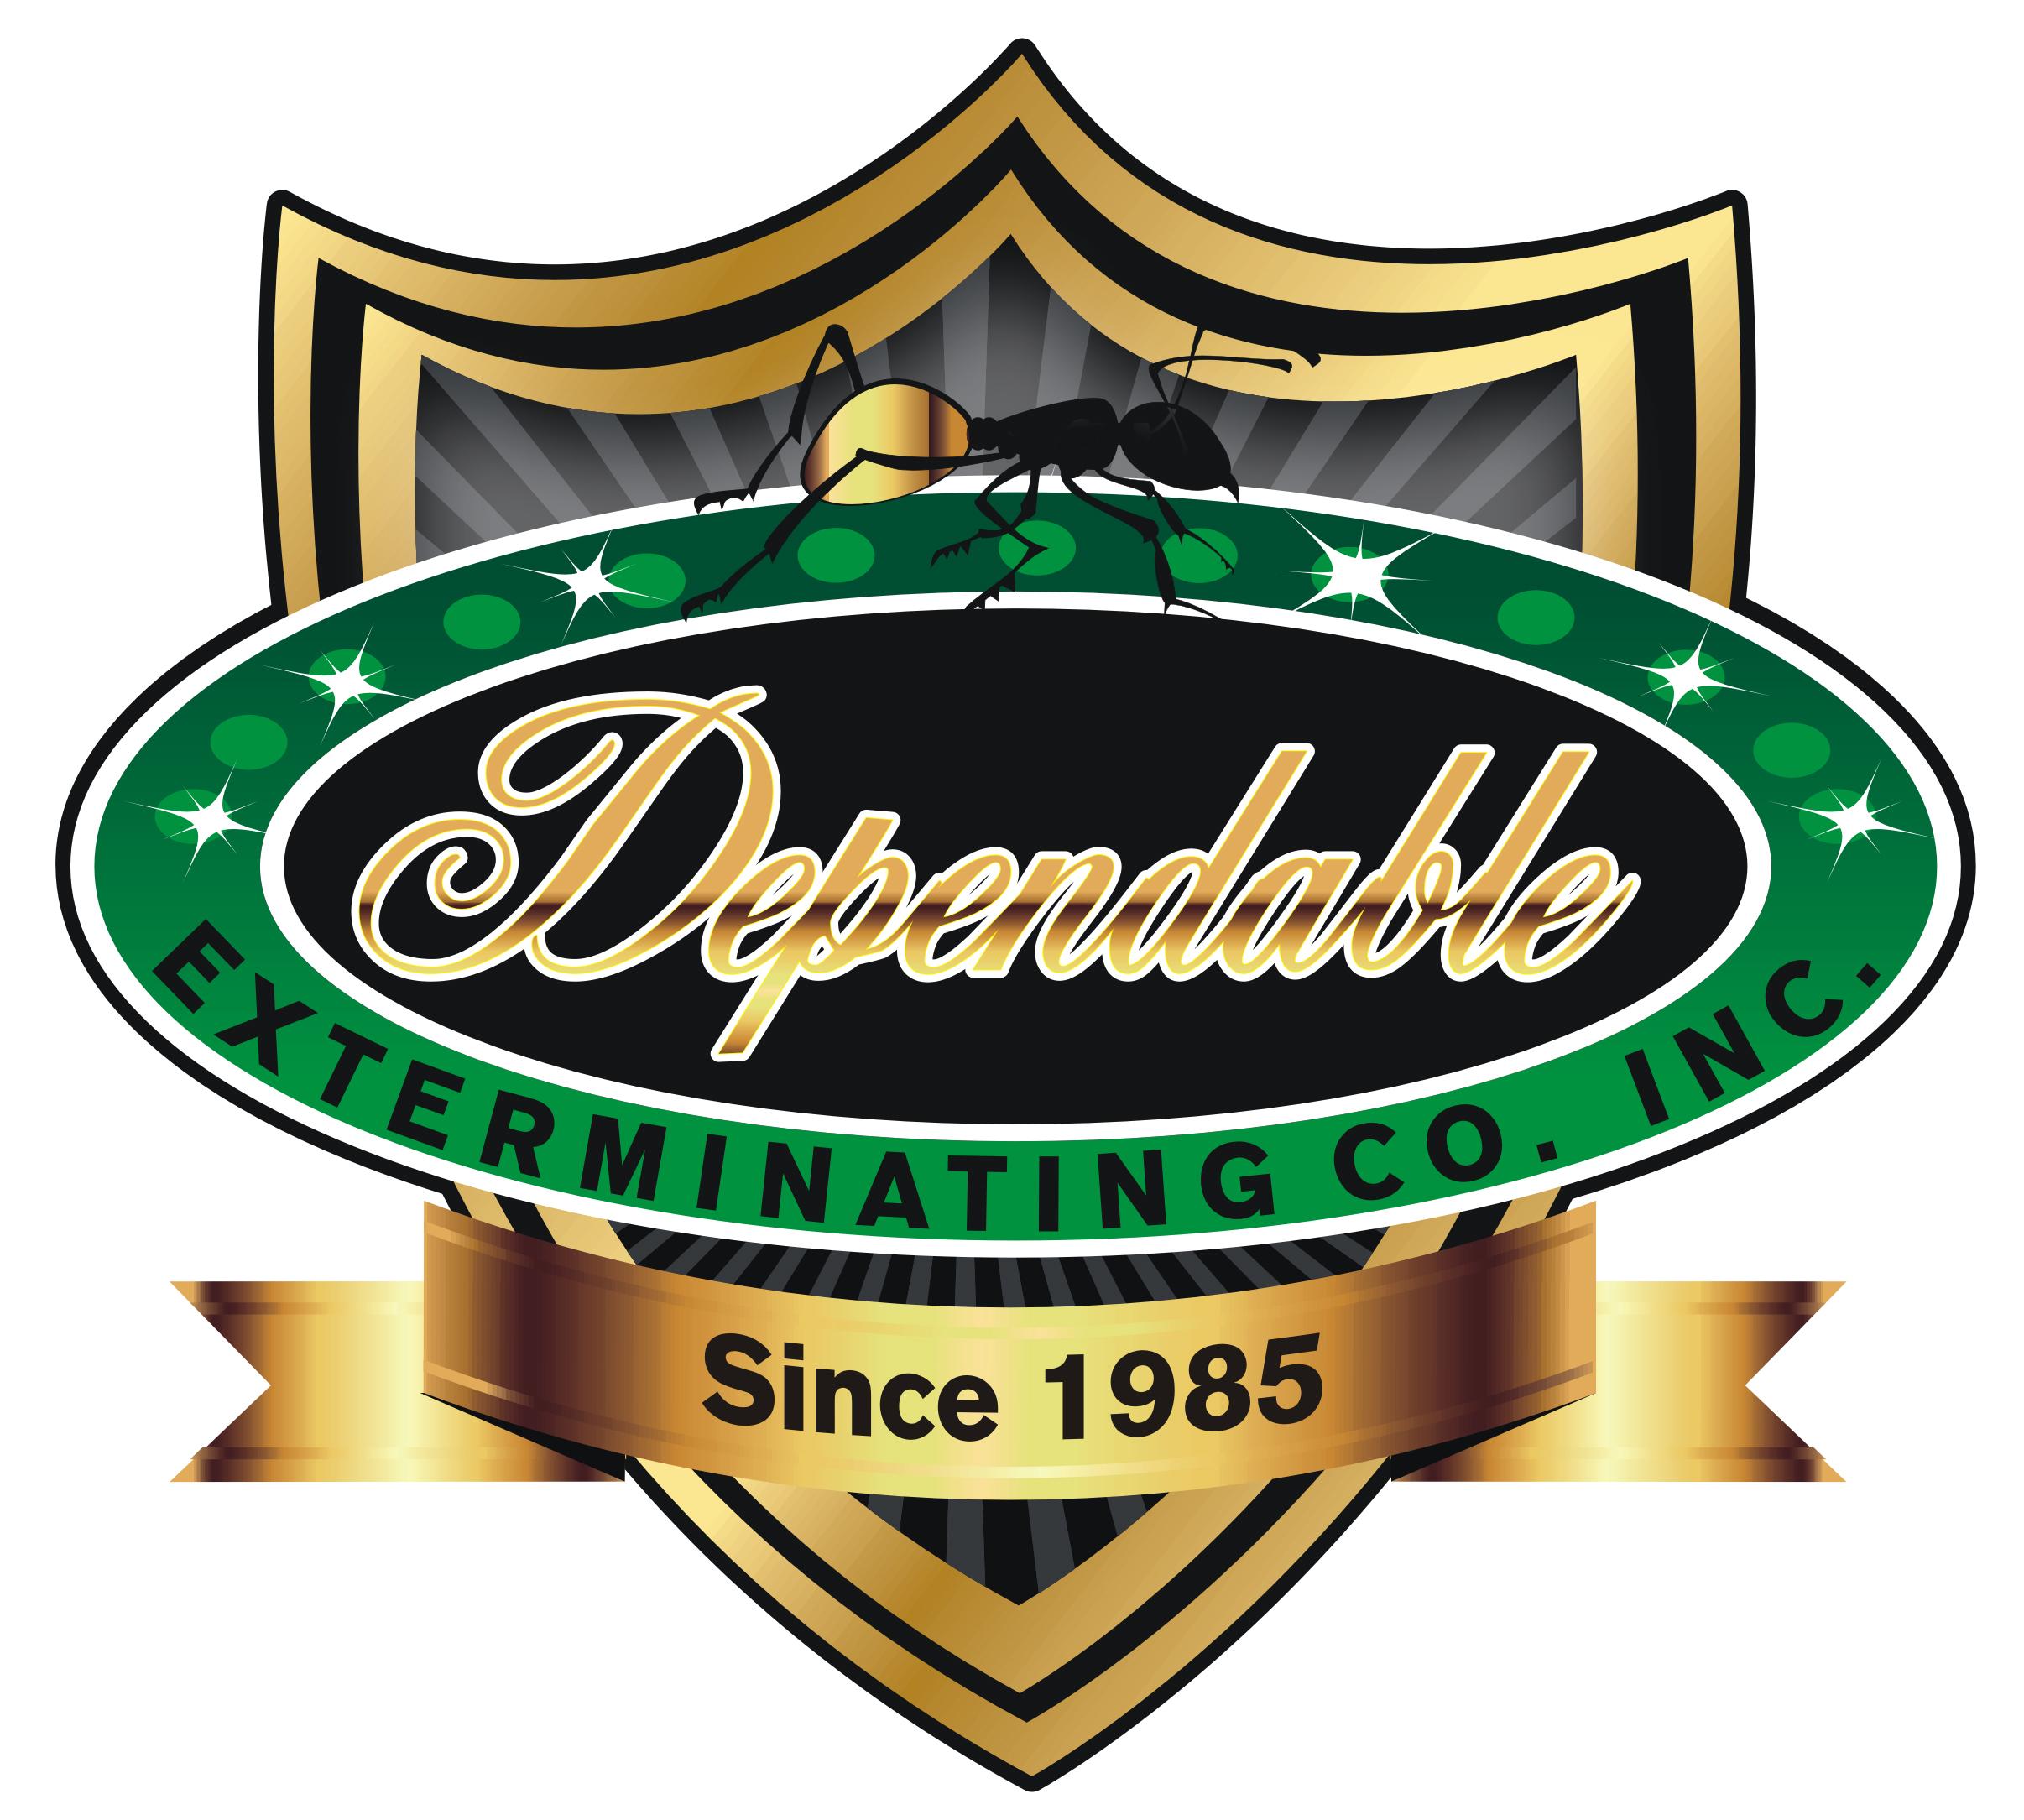 Dependable Exterminating Co., Inc.